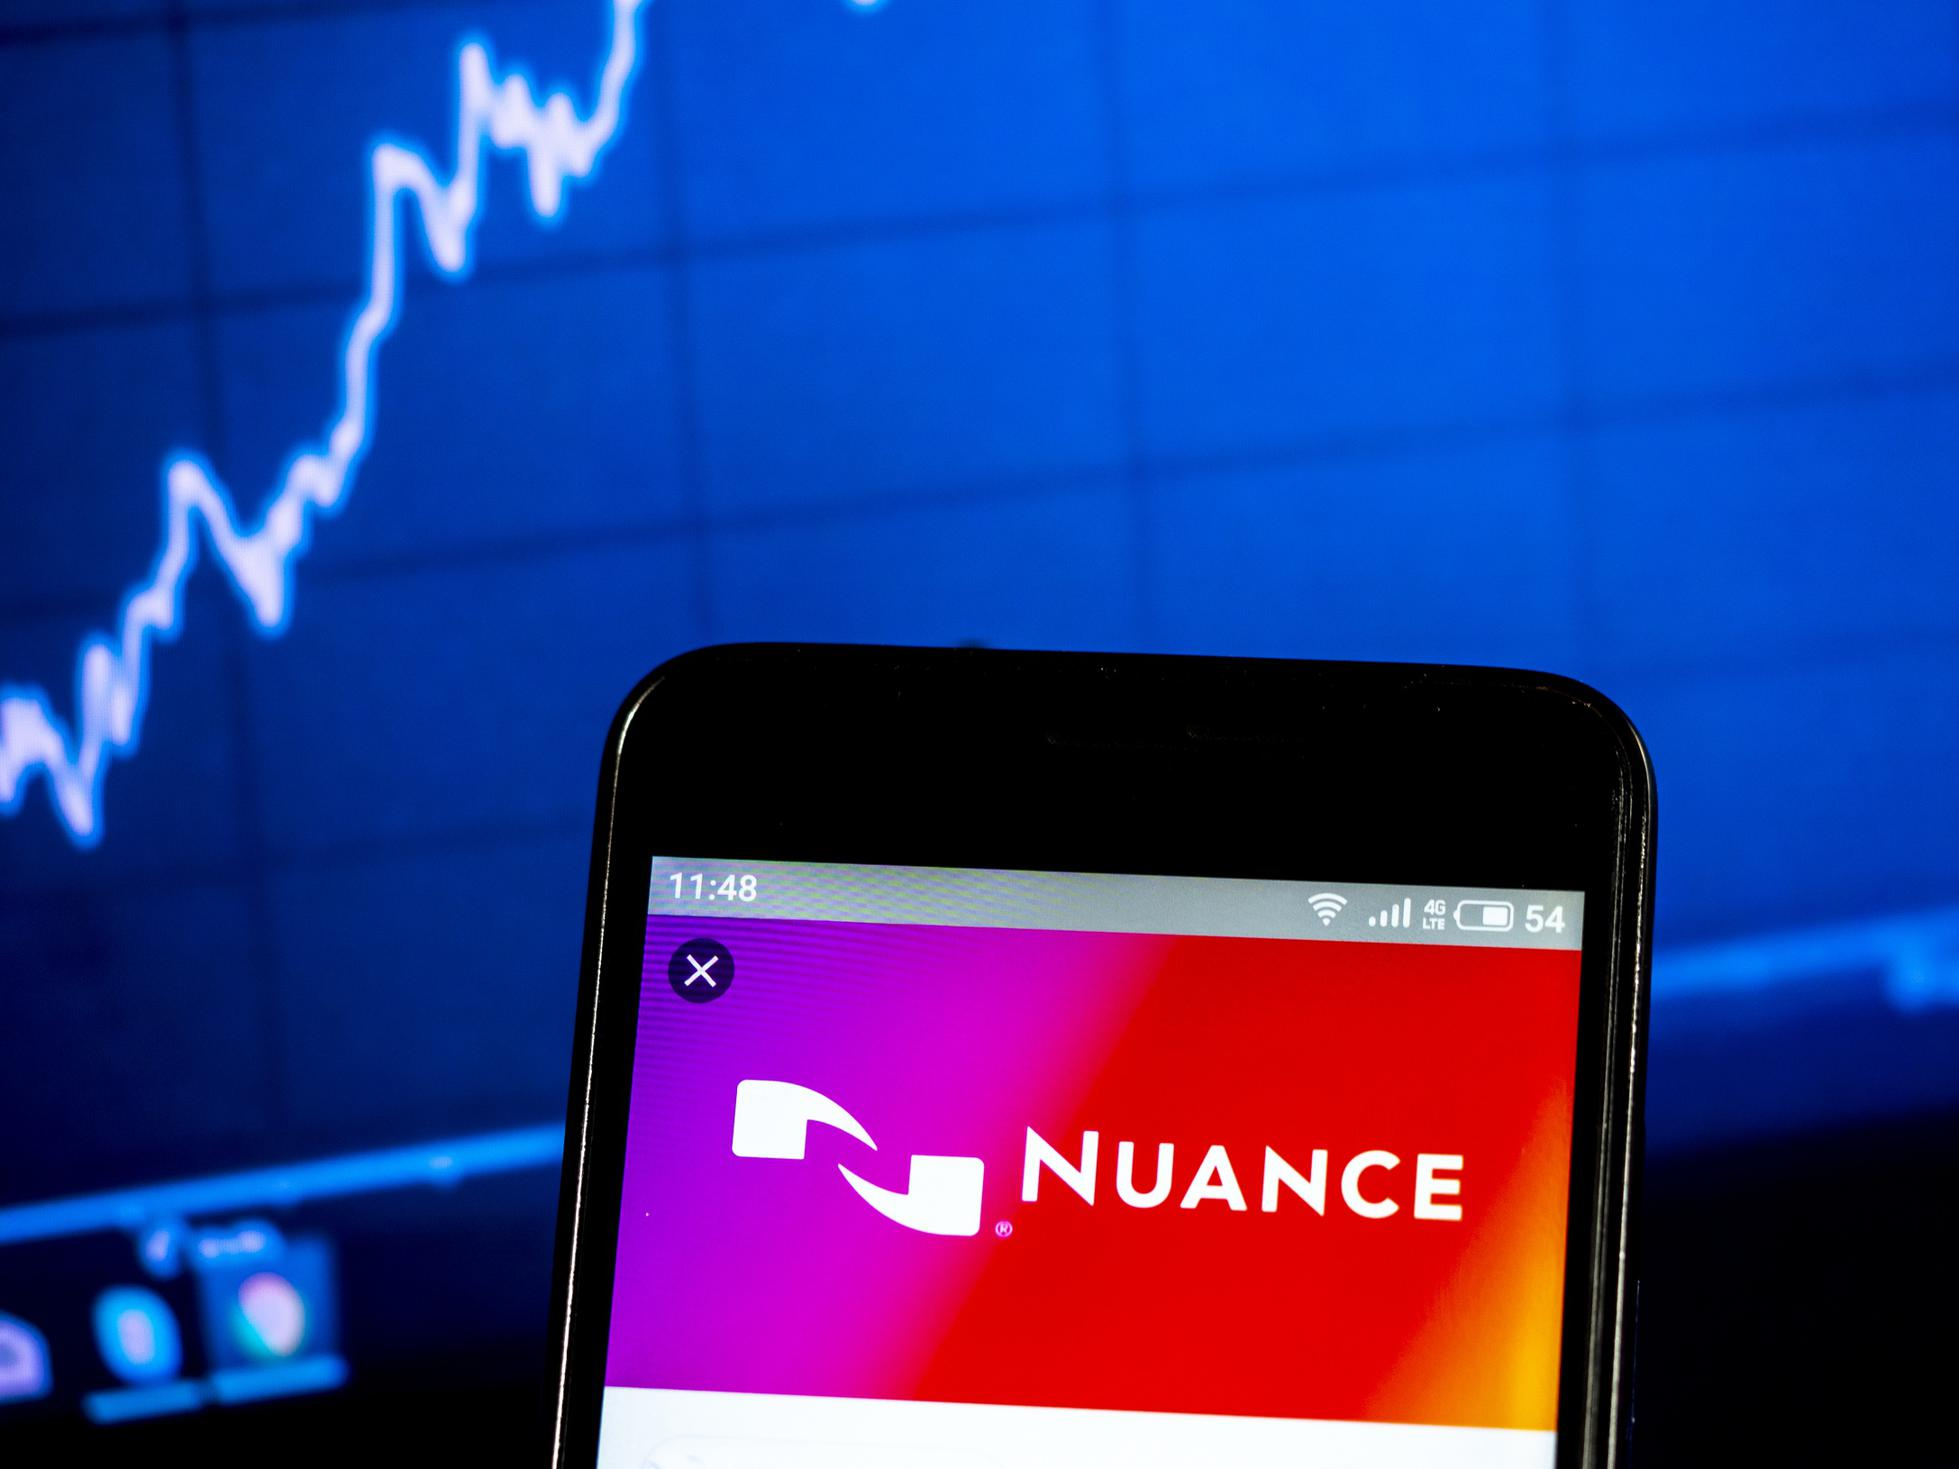 Nuance Communications logo on a smartphone.